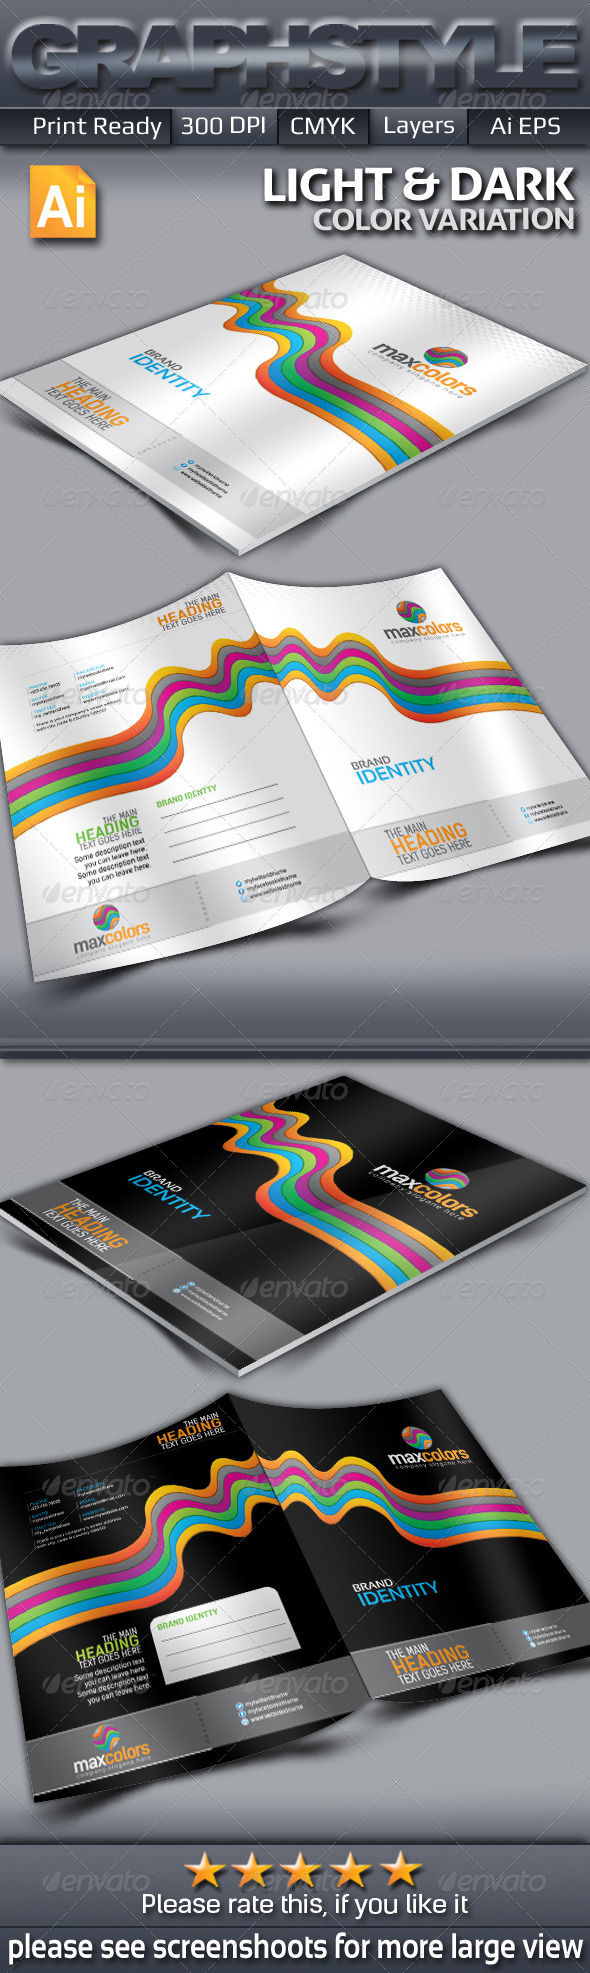 GraphicRiver maxcolors Presentation Folder Templates 5701789